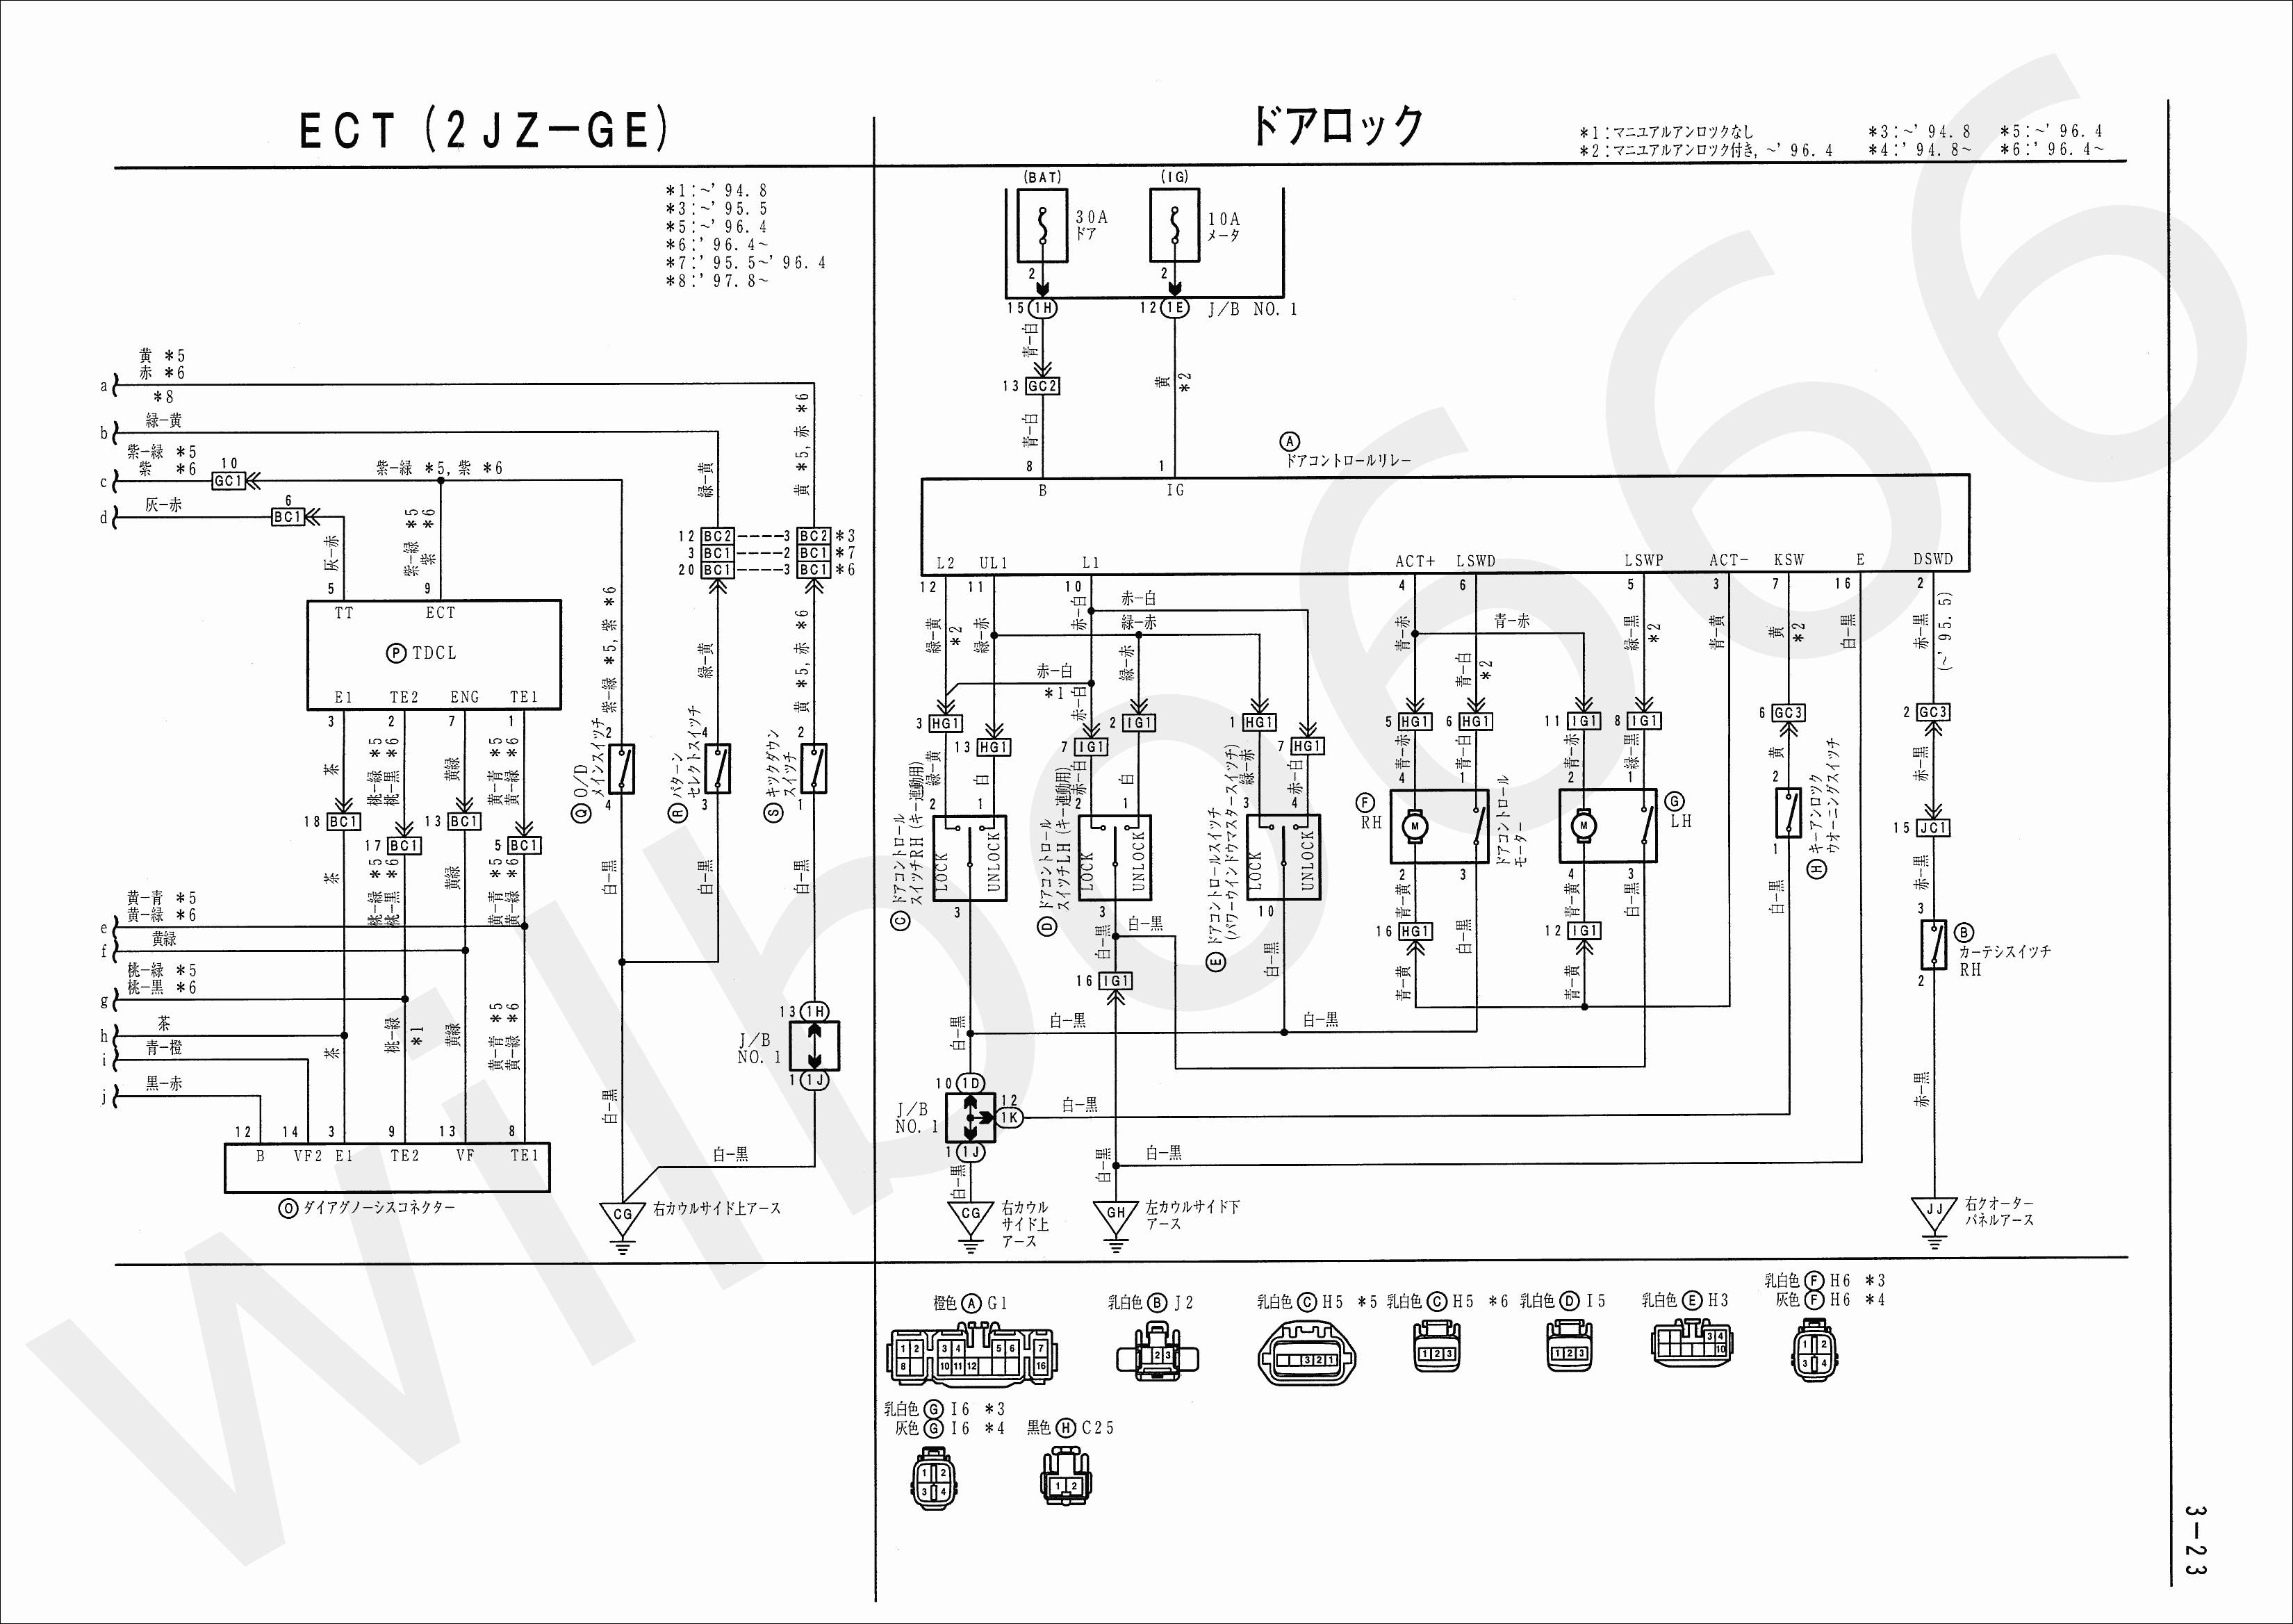 Lawn Mower Ignition Switch Wiring Diagram Inspirational Wiring - Lawn Mower Ignition Switch Wiring Diagram